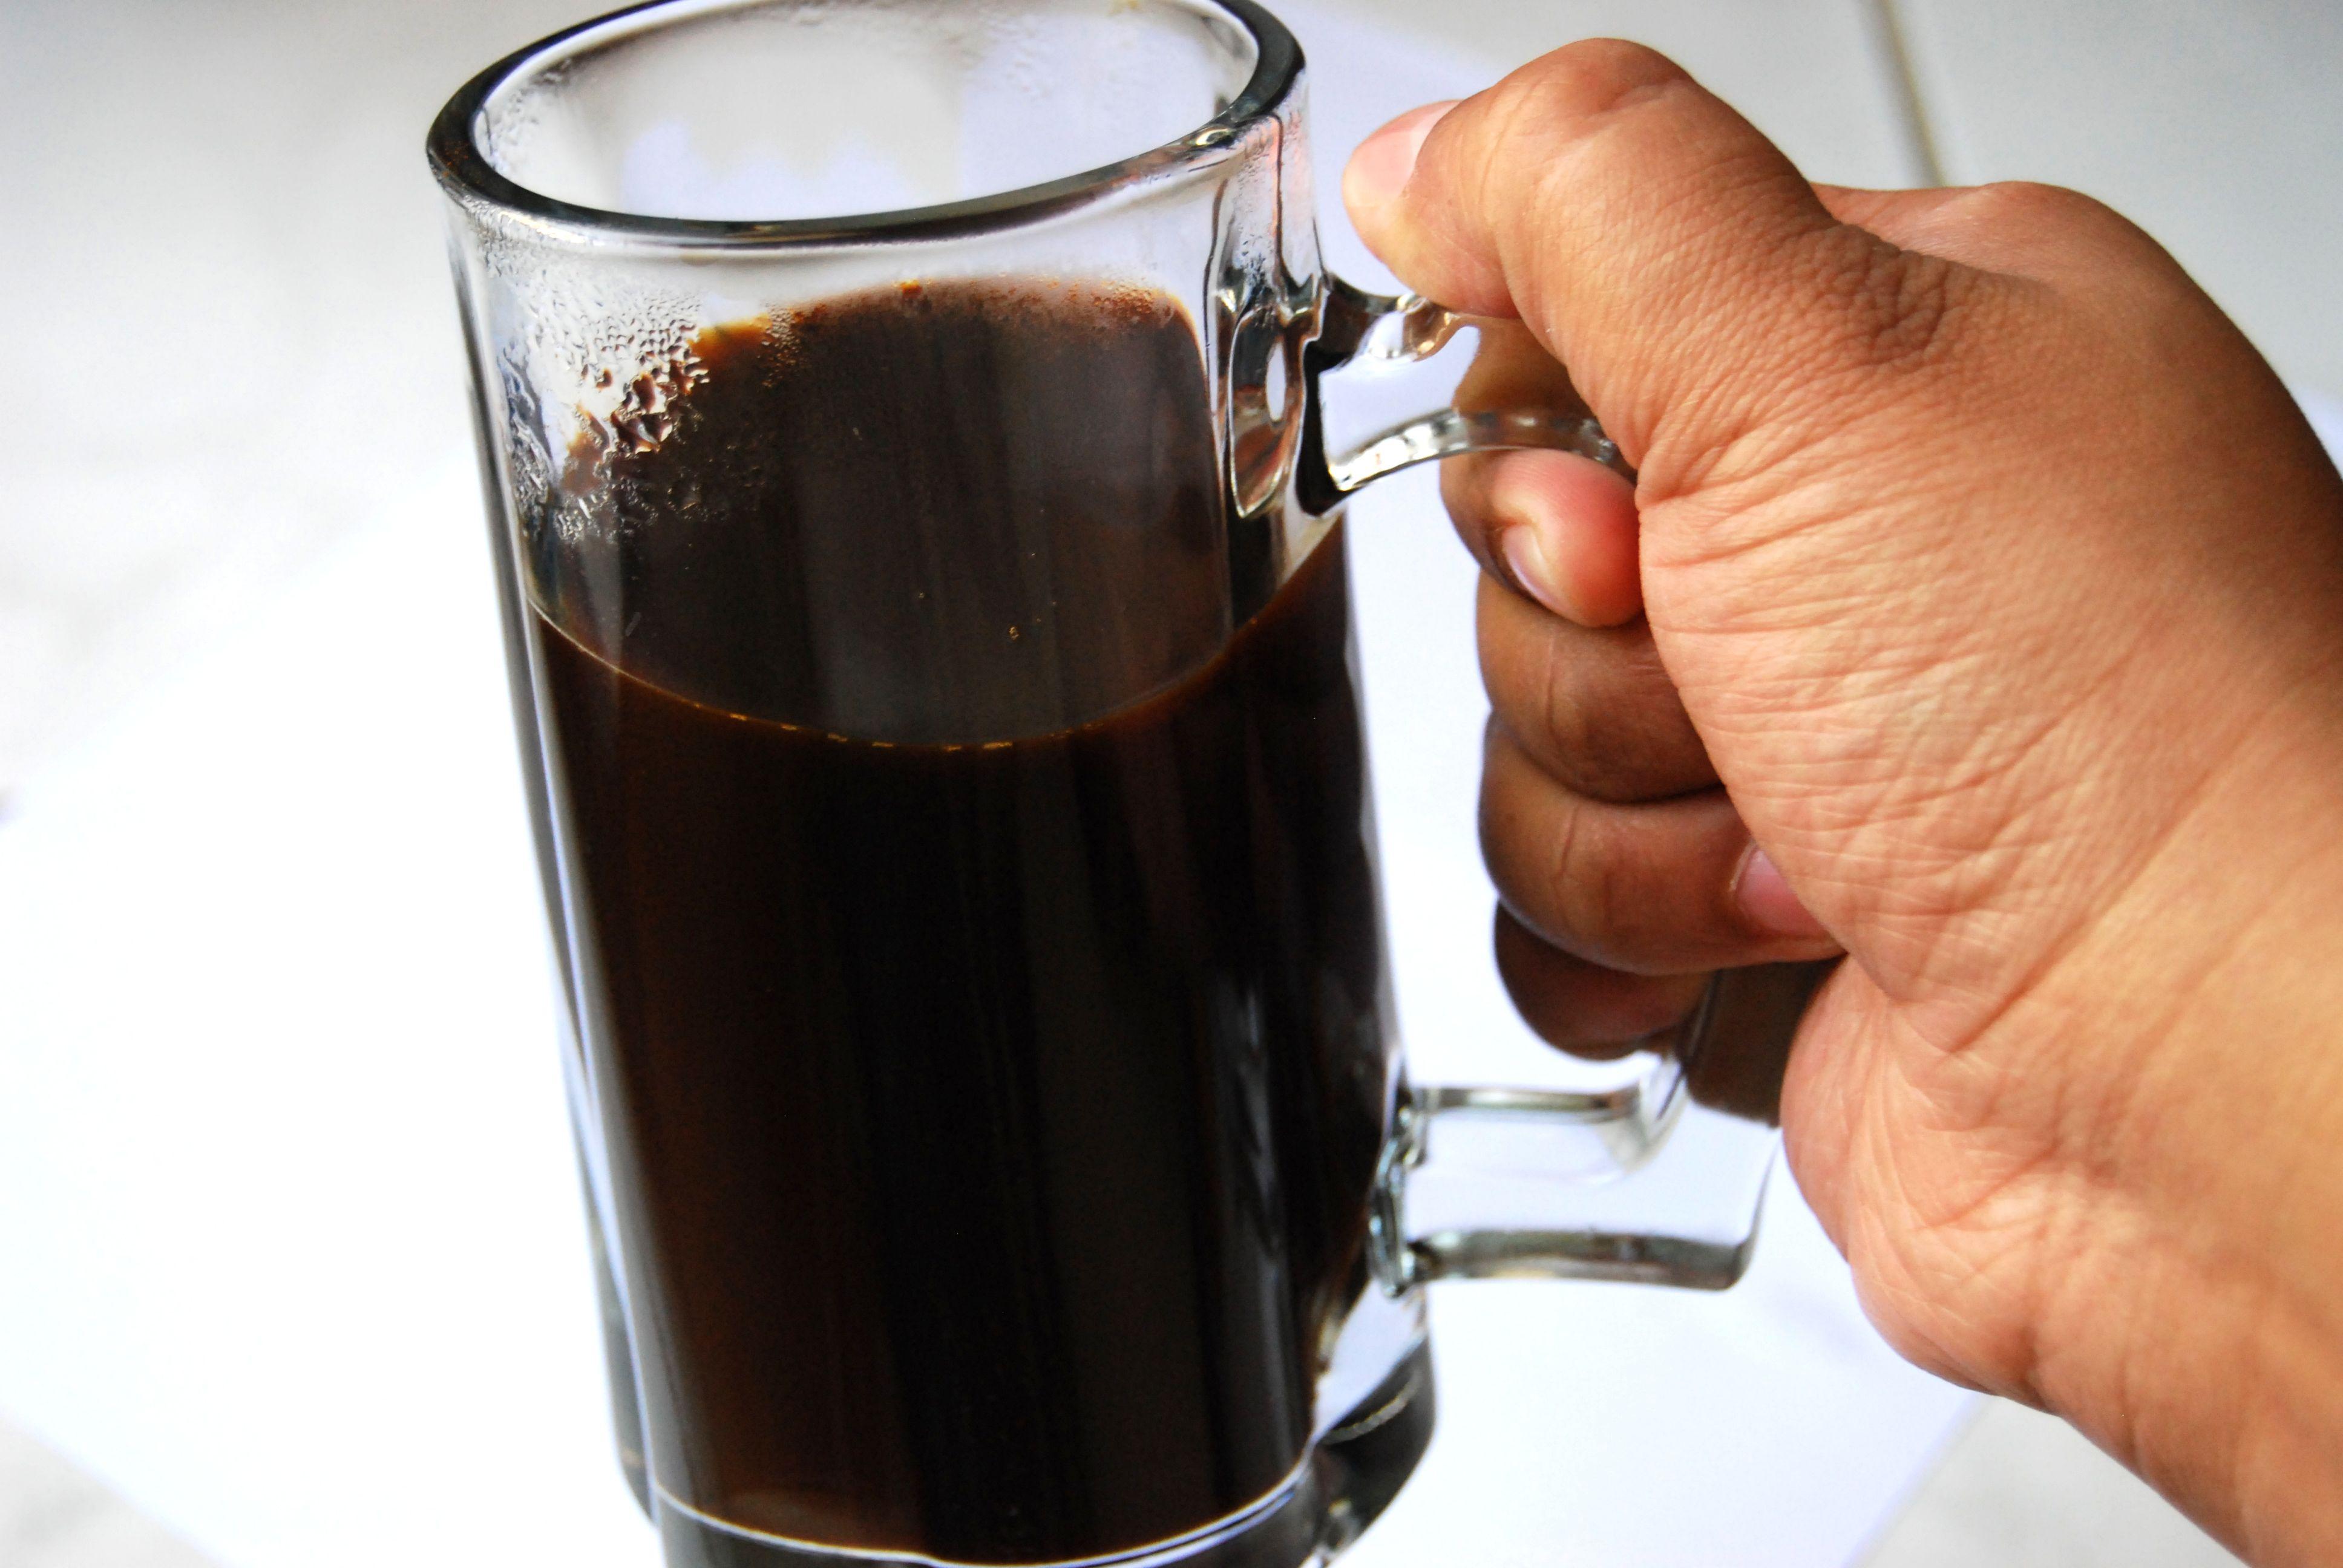 Make Indonesian Kopi Tobruk Uses for coffee grounds